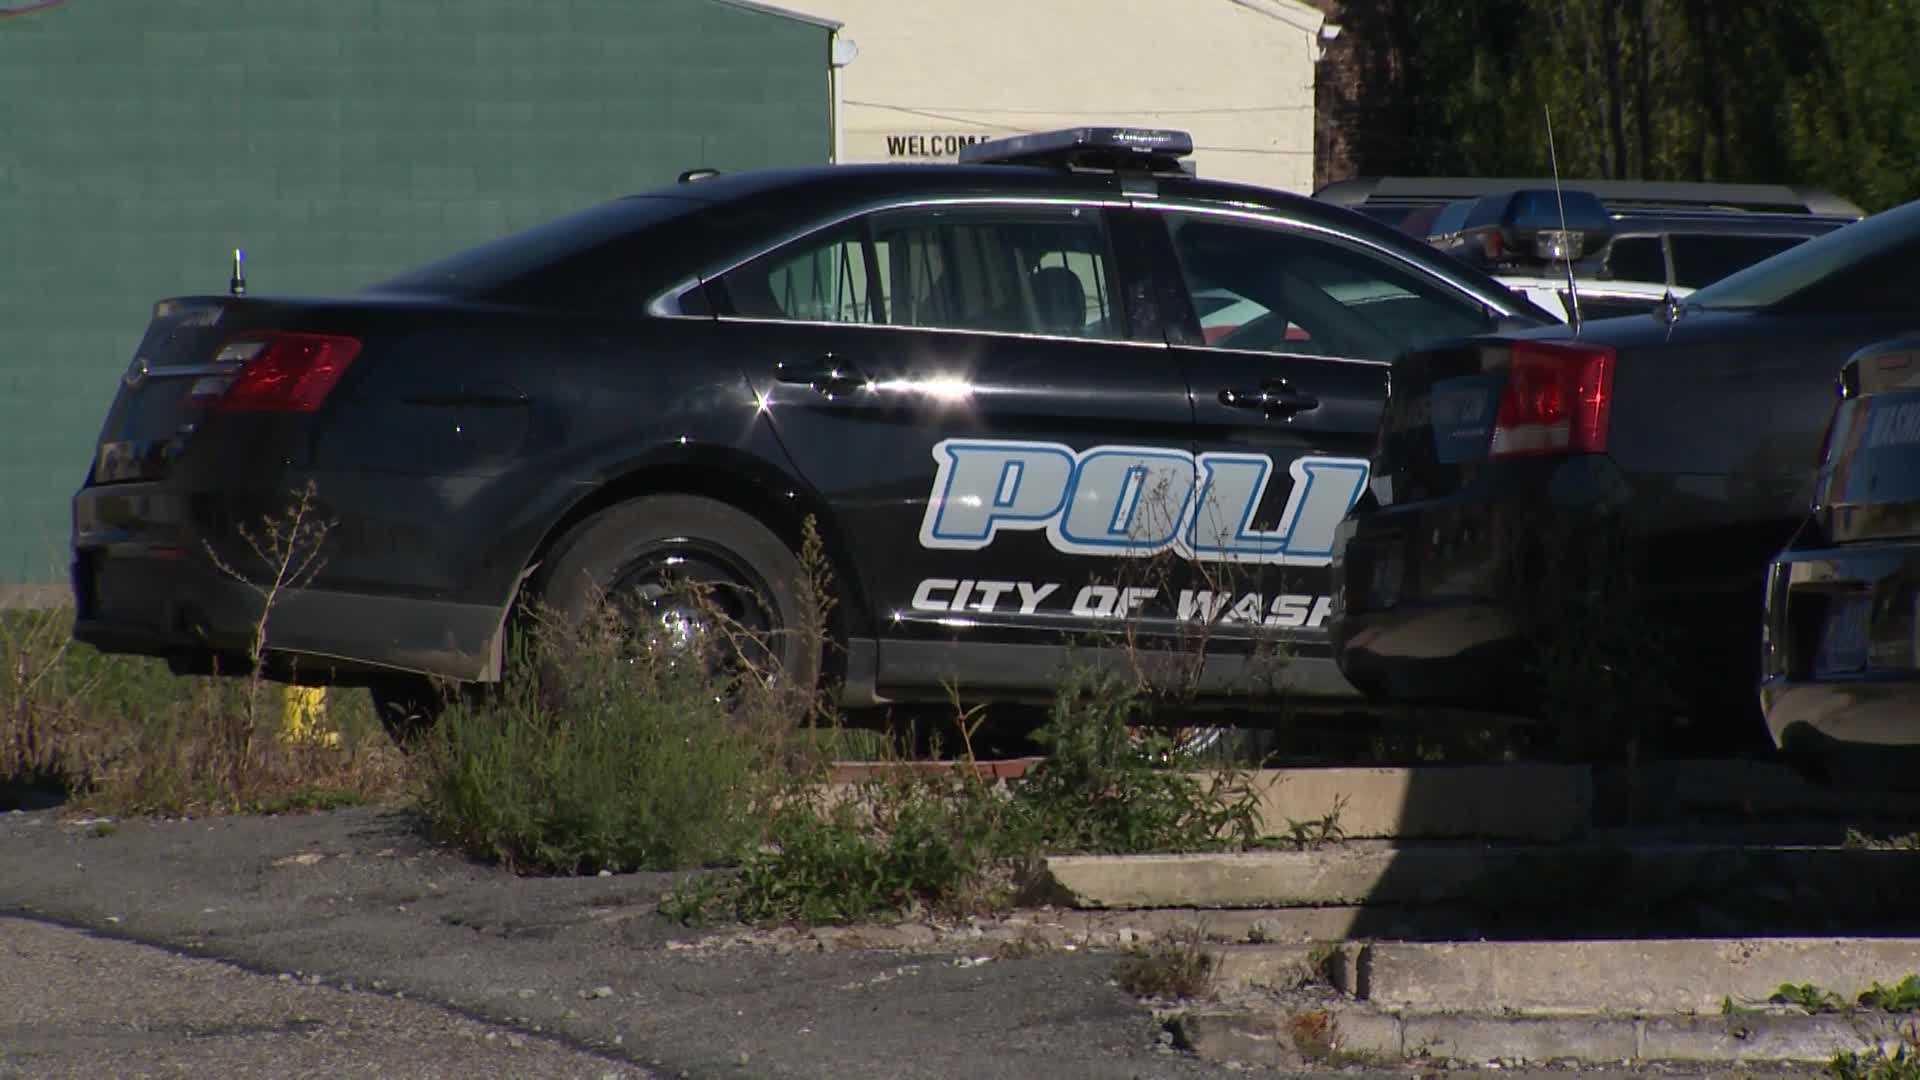 A Washington city police car